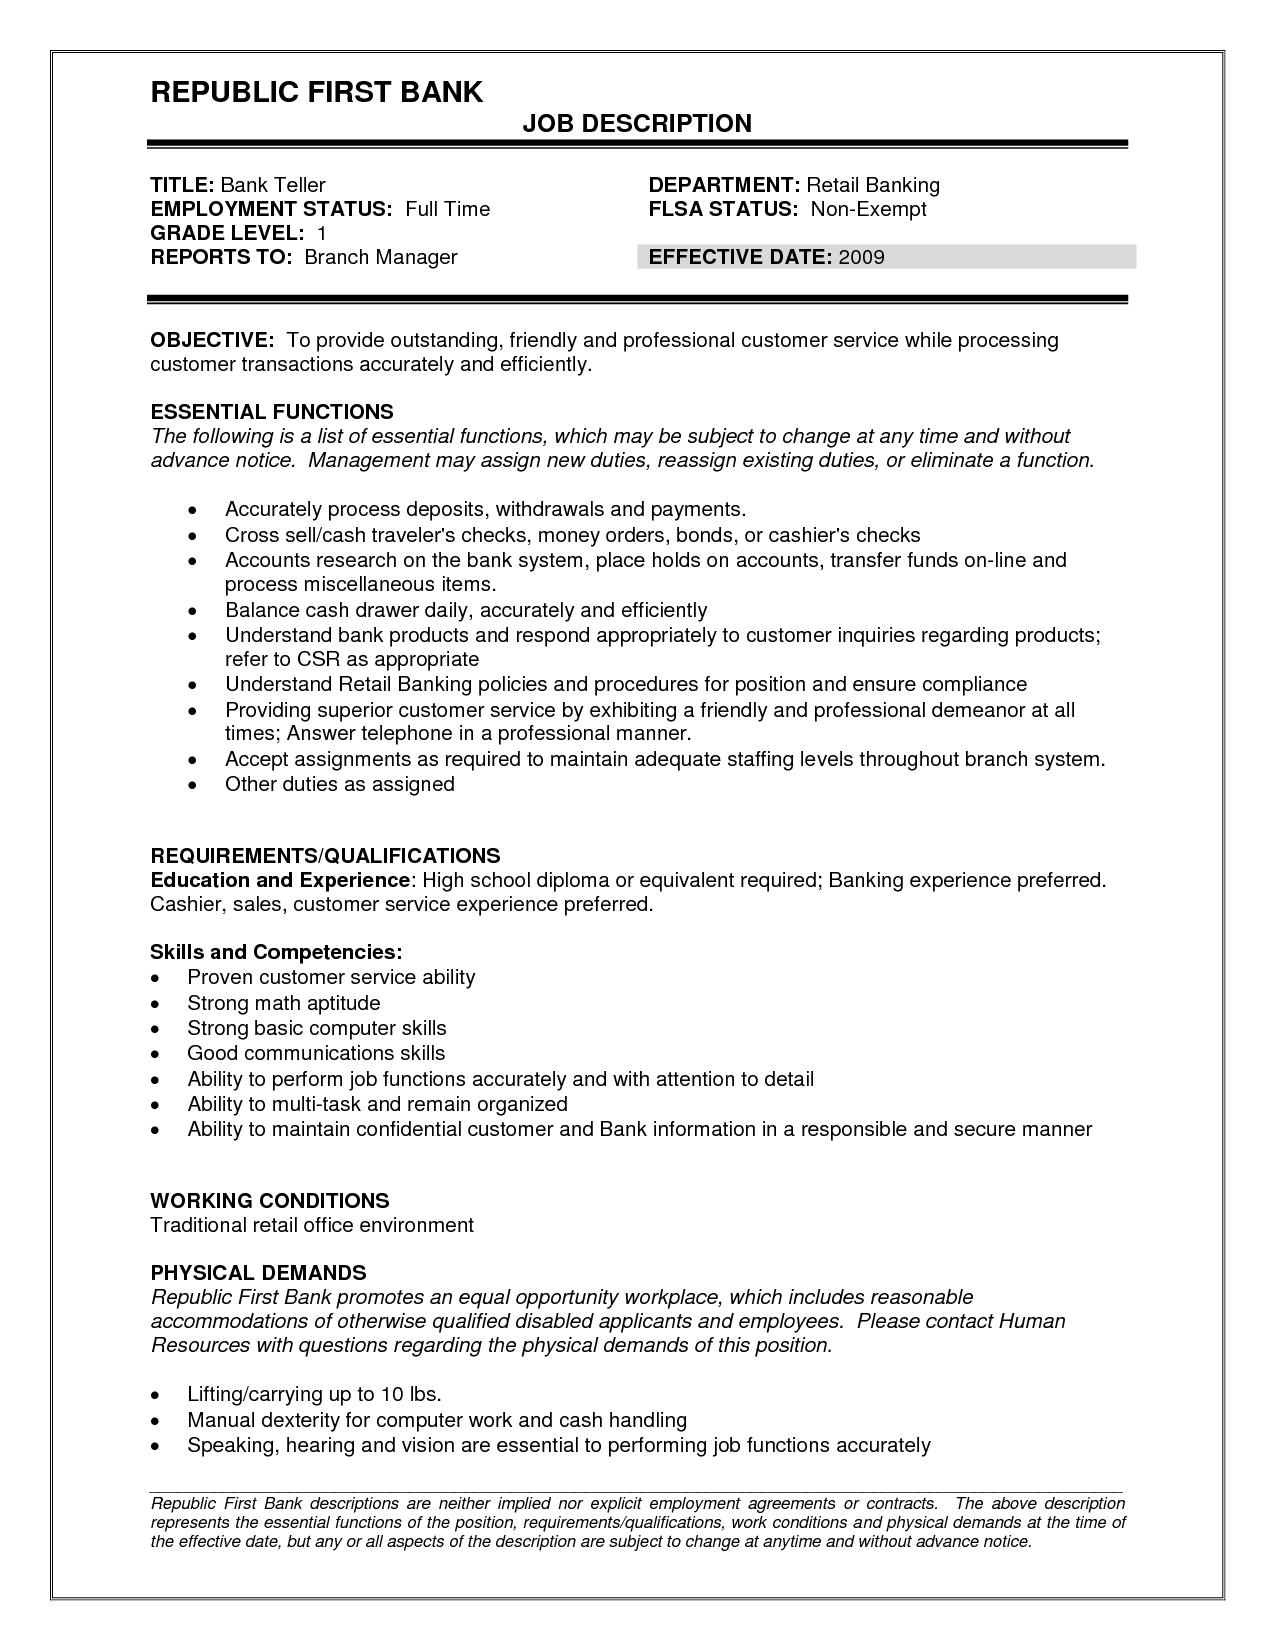 Bank Teller Job Description (Dengan gambar)